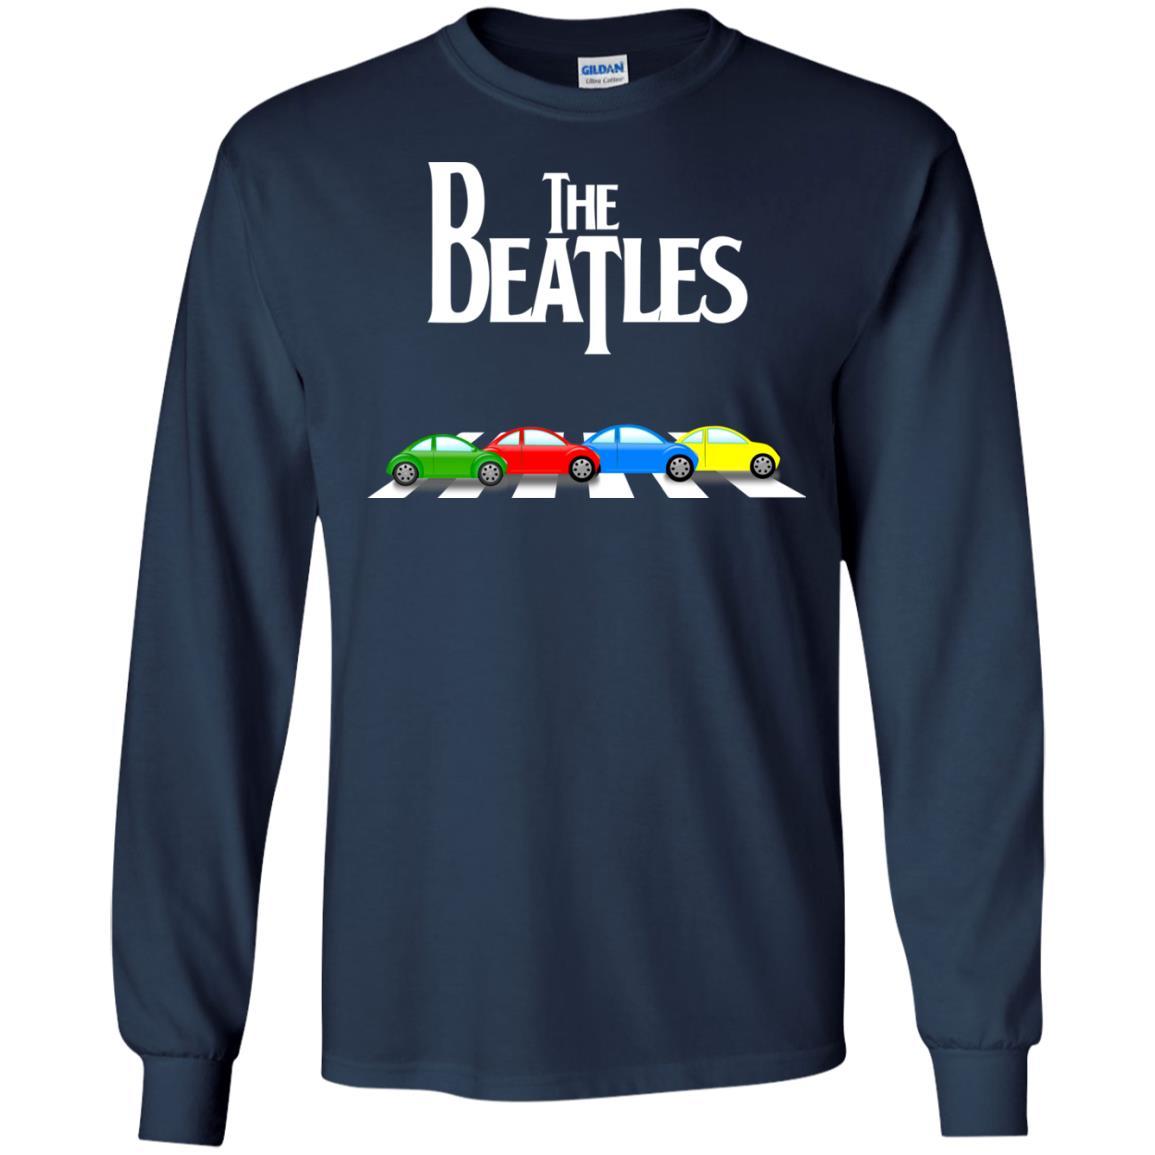 image 329 - The Beatles cars shirt, hoodie, tank